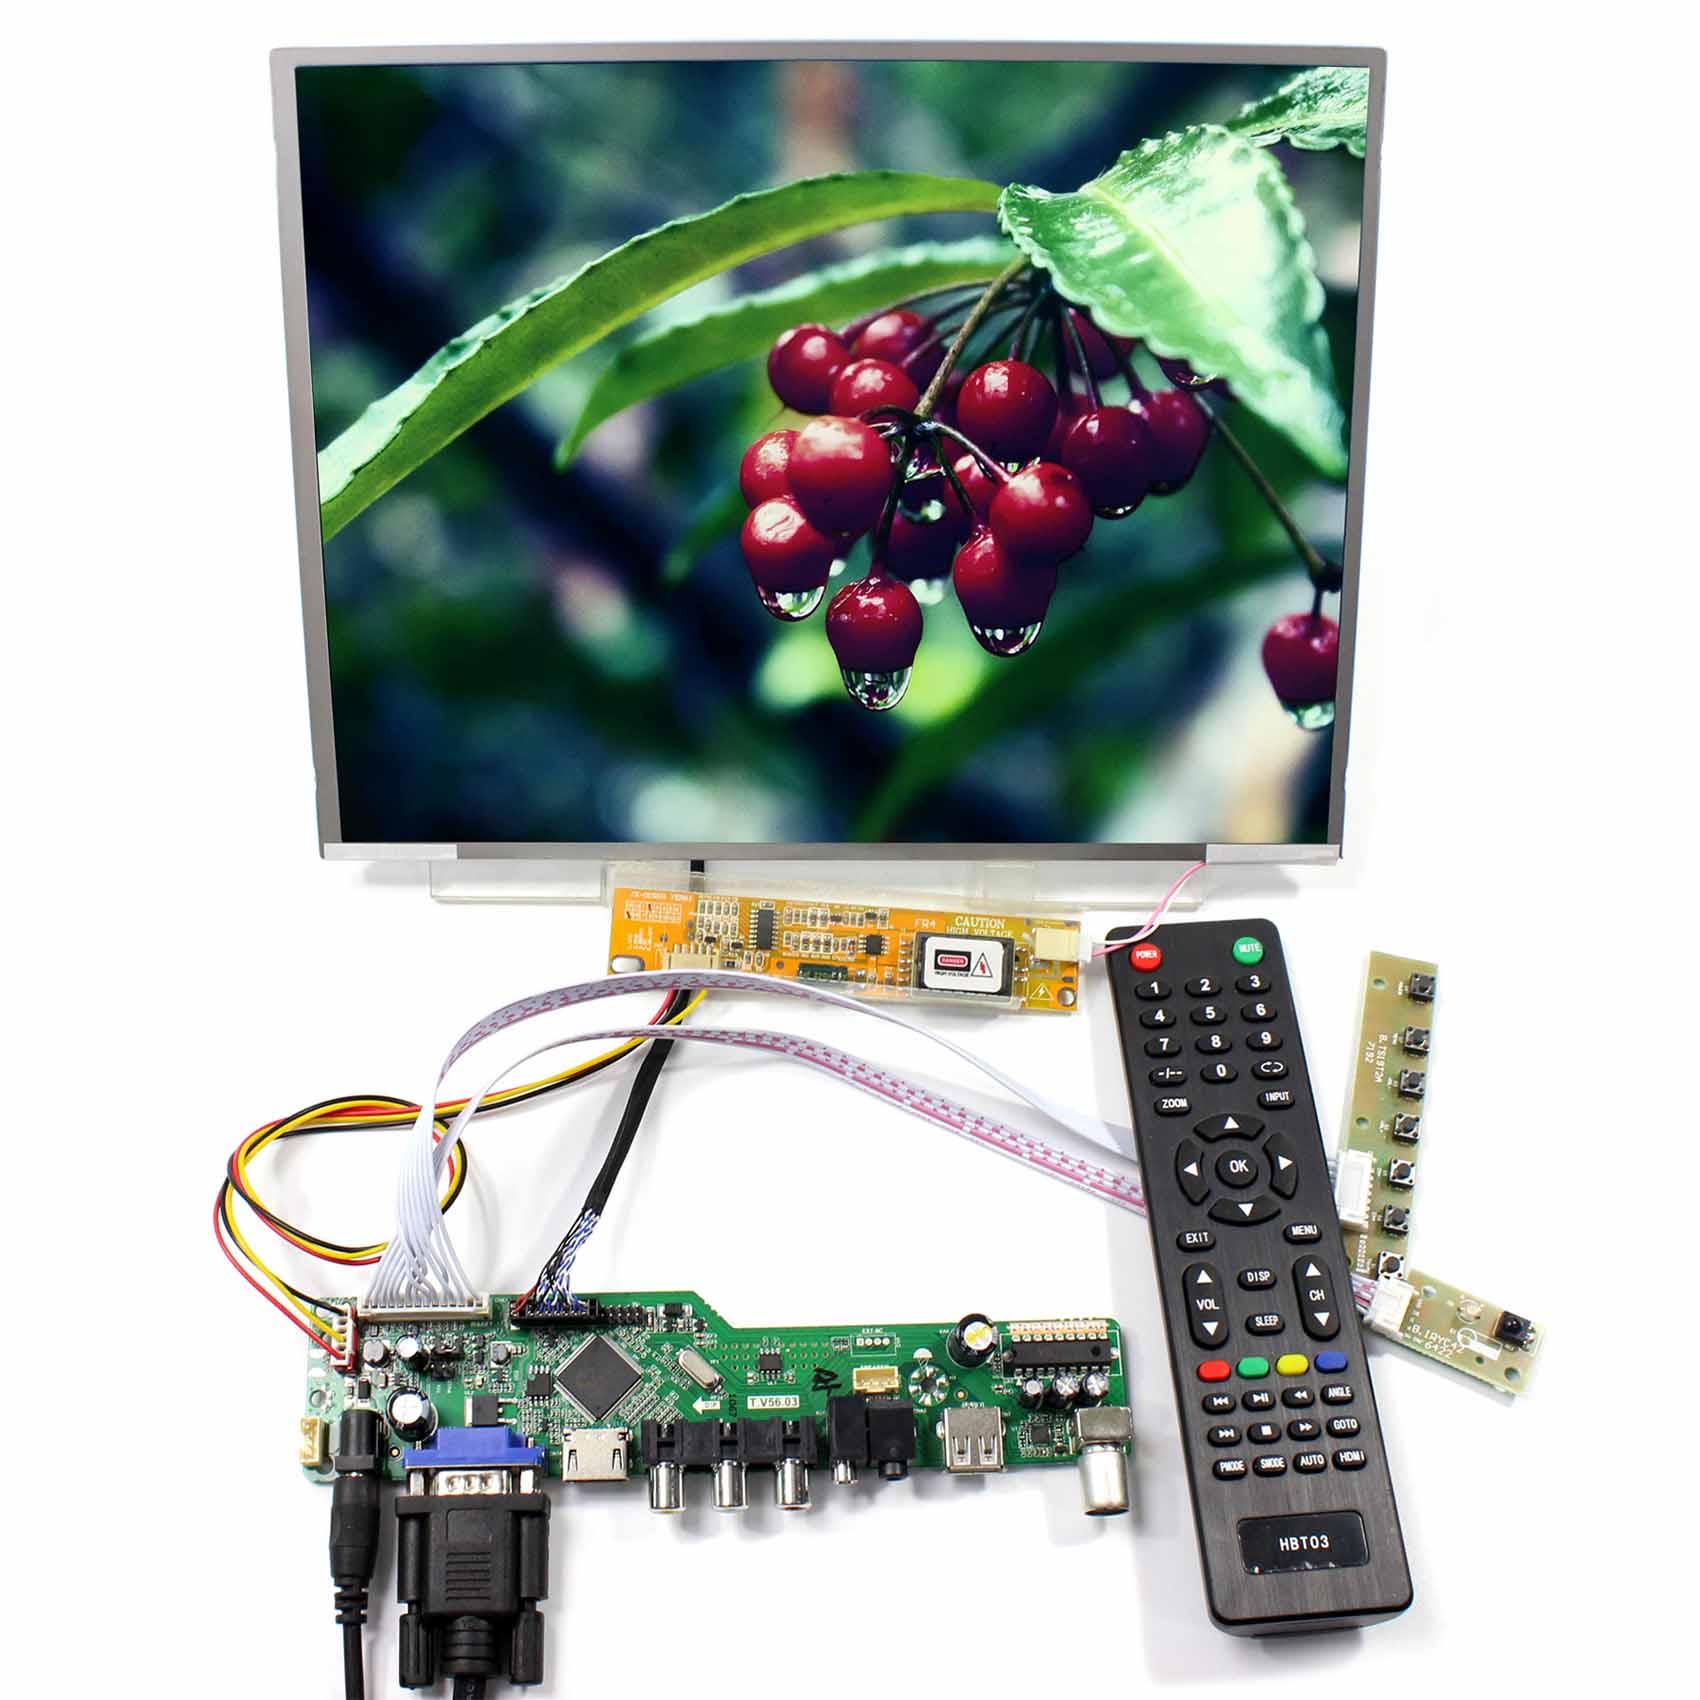 TV HDMI VGA AV USB AUDIO LCD Cotntrol Board 12.1inch LTN121X01 1024x768 LCD